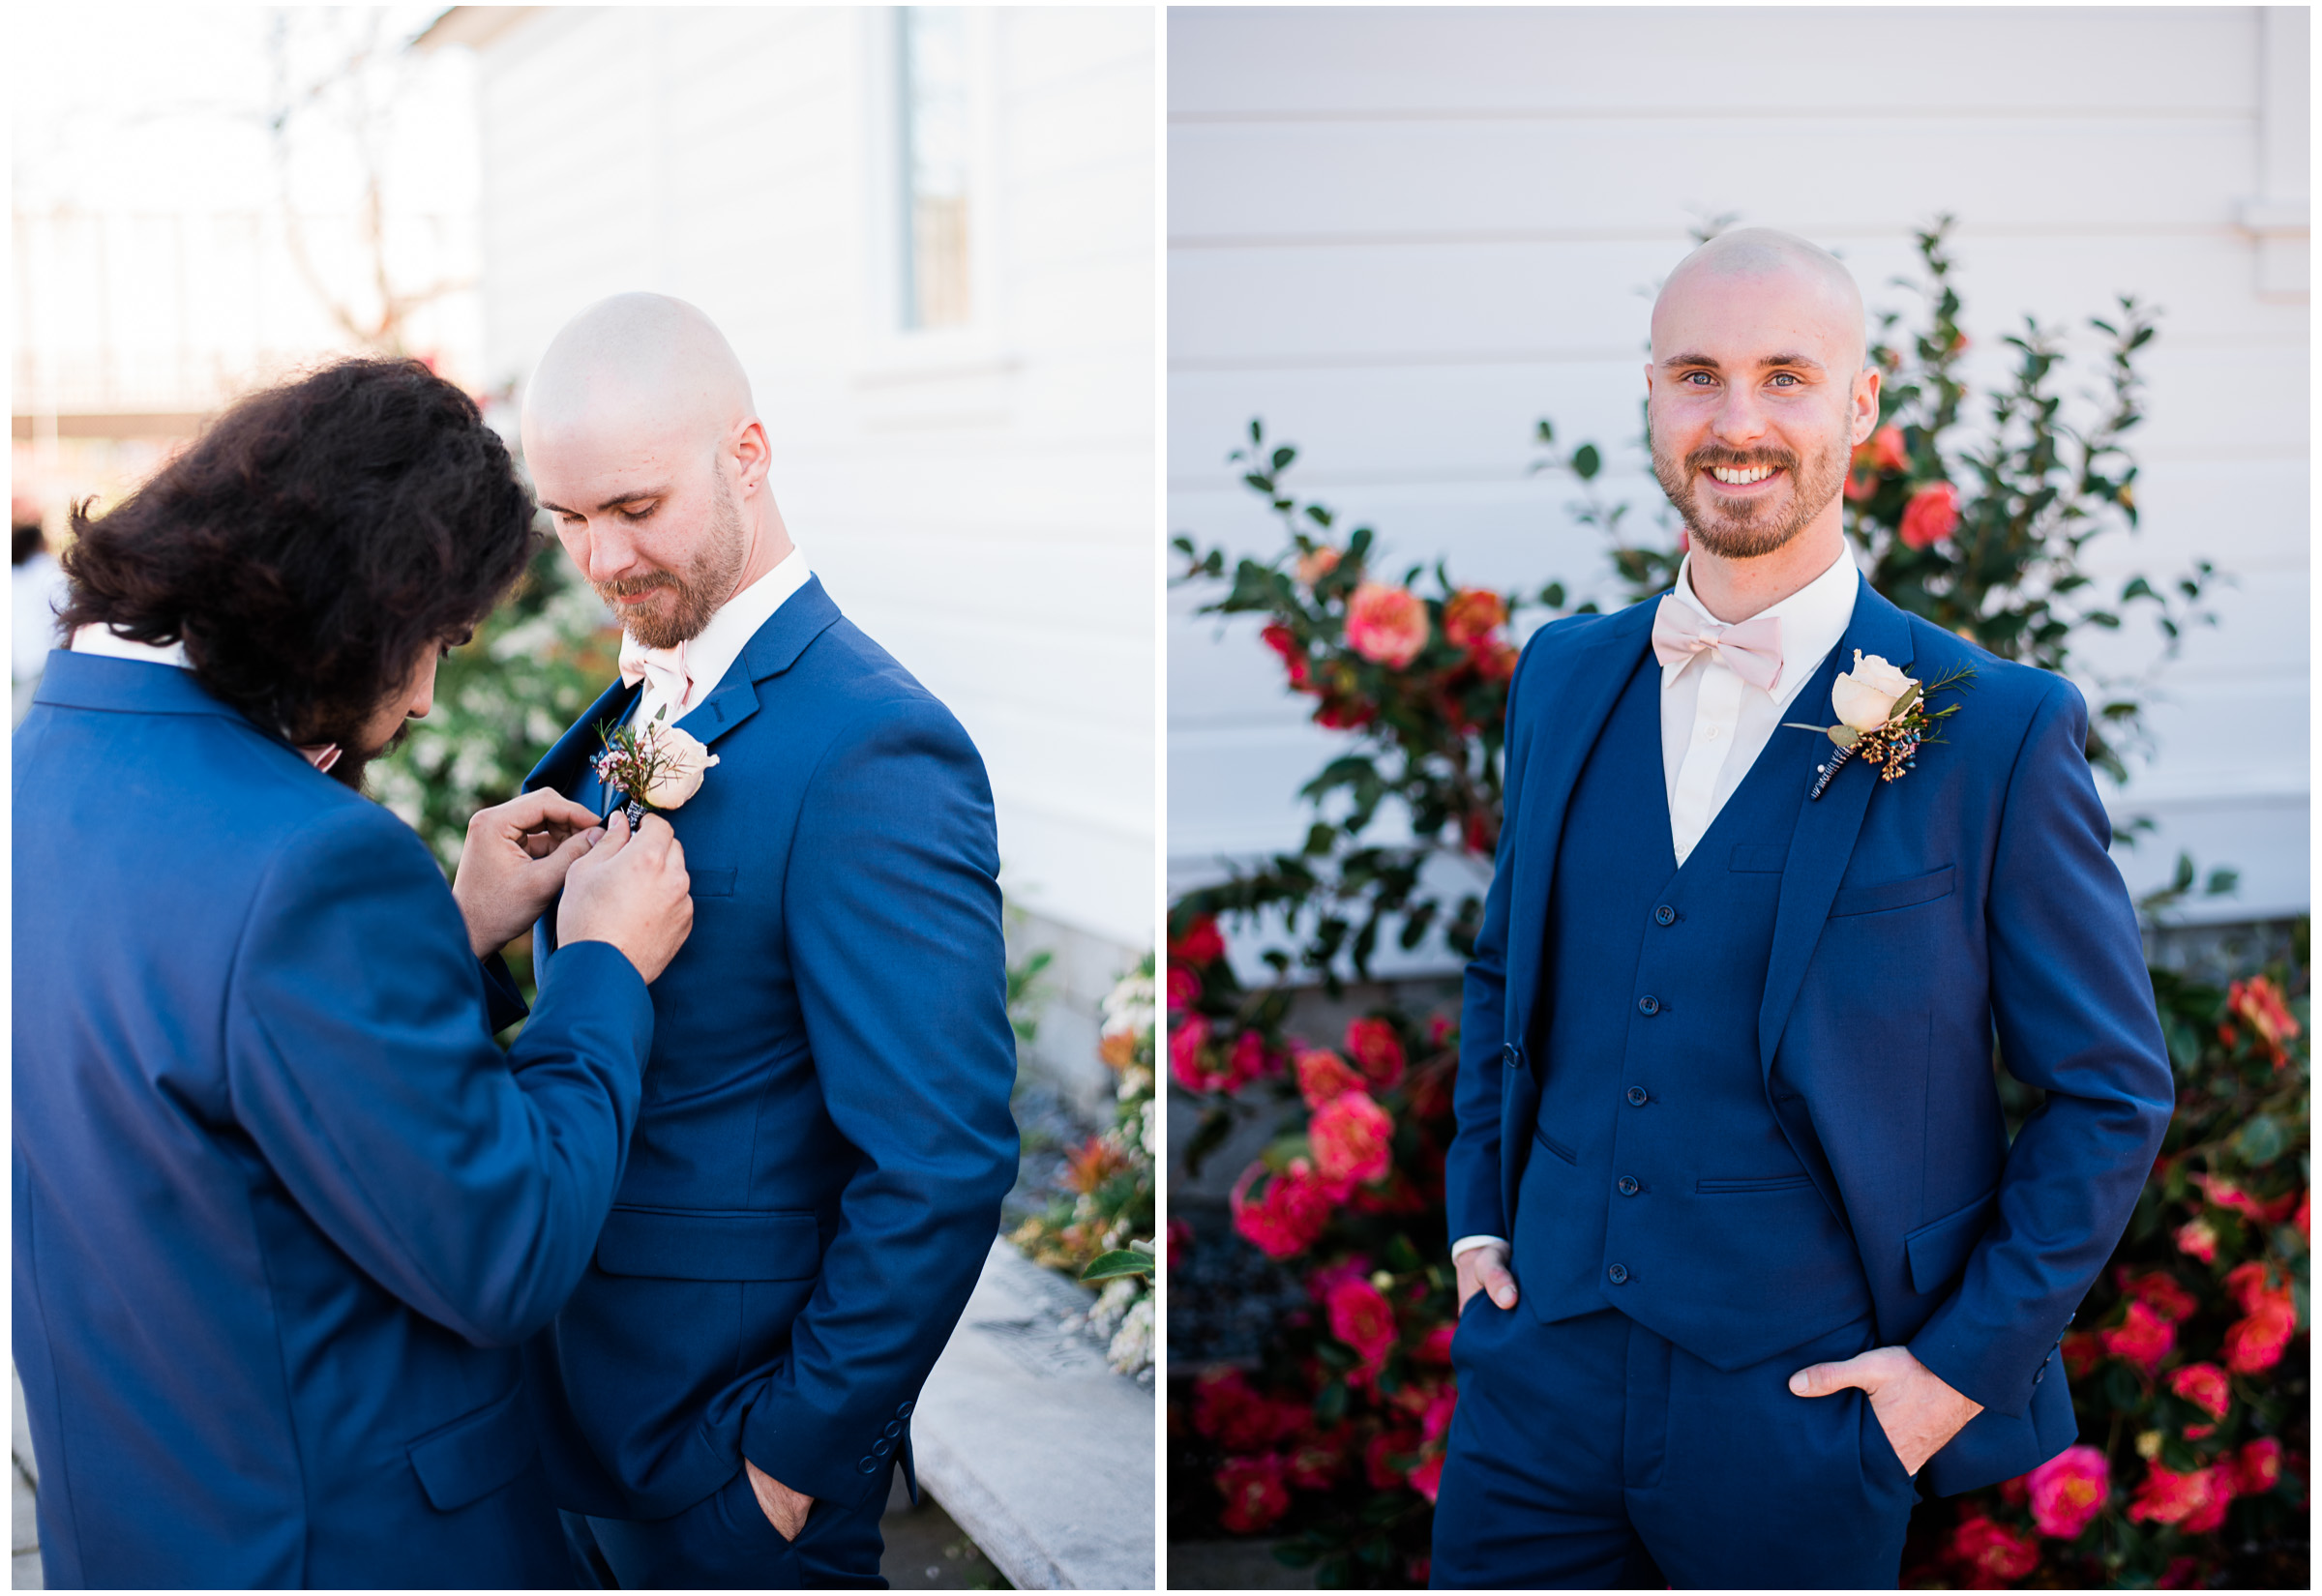 Sacramento Wedding - Sacramento Photographer - Justin Wilcox Photography - 7.jpg